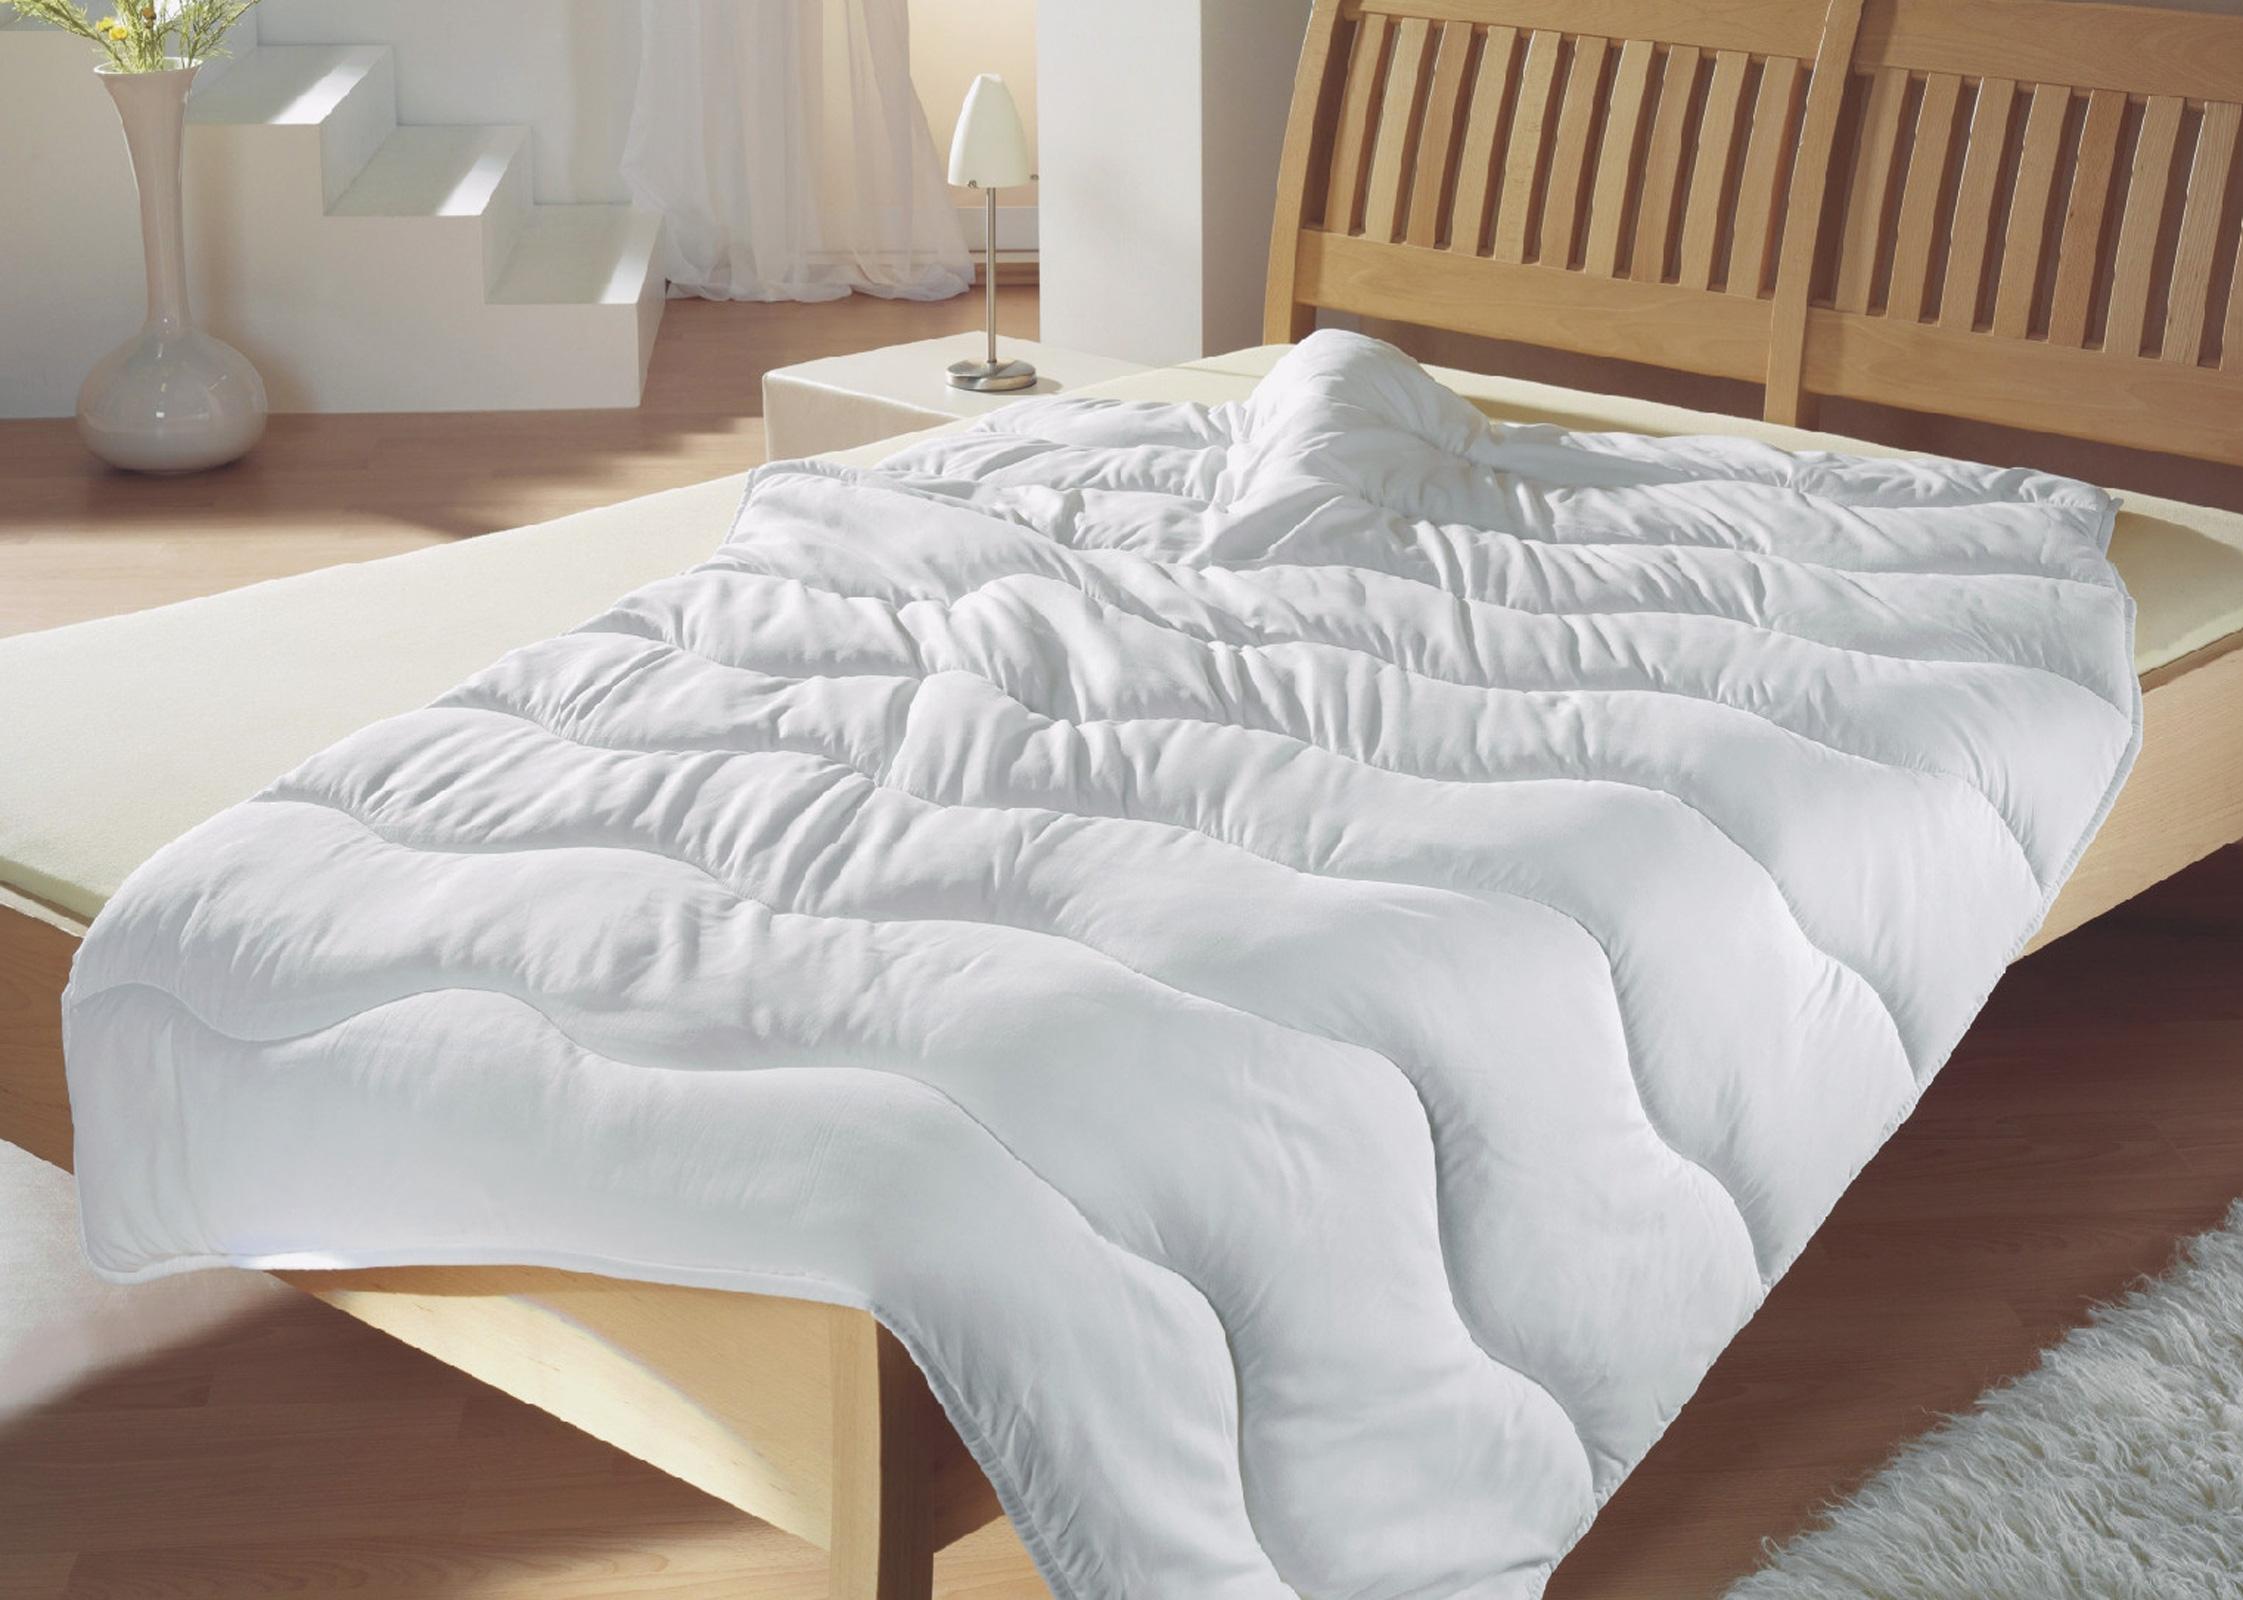 4 jahreszeiten bett bettdecke moon 135x200 155x220 200x200 200x220 ebay. Black Bedroom Furniture Sets. Home Design Ideas